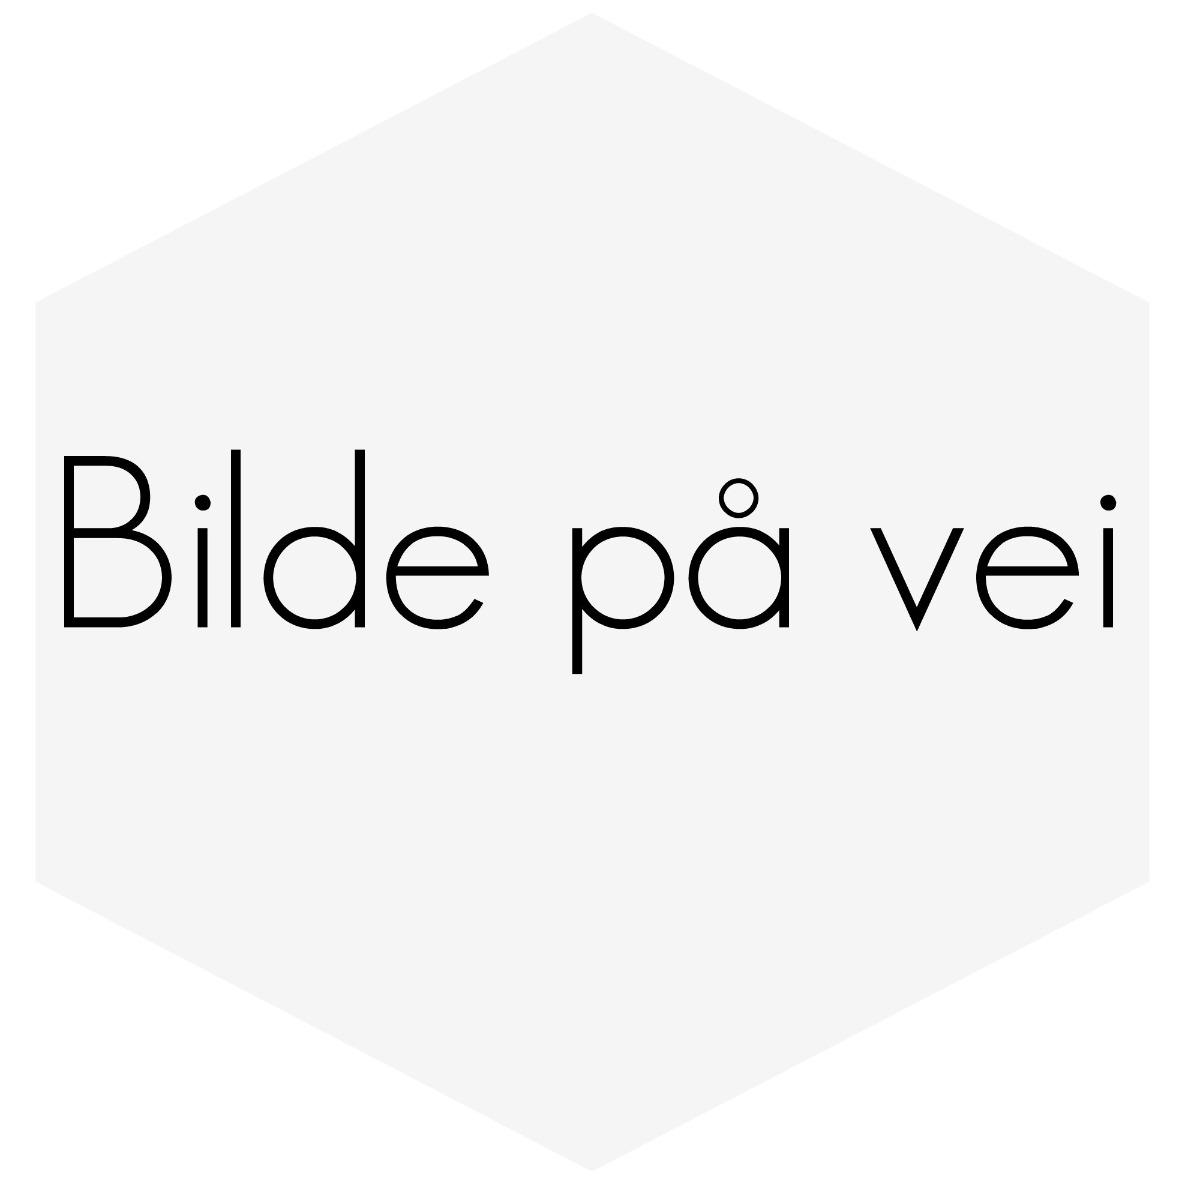 HOVEDLAMPE S80 VOLVO 1999>12.MND.2005 CROM VERSJON HØYRE